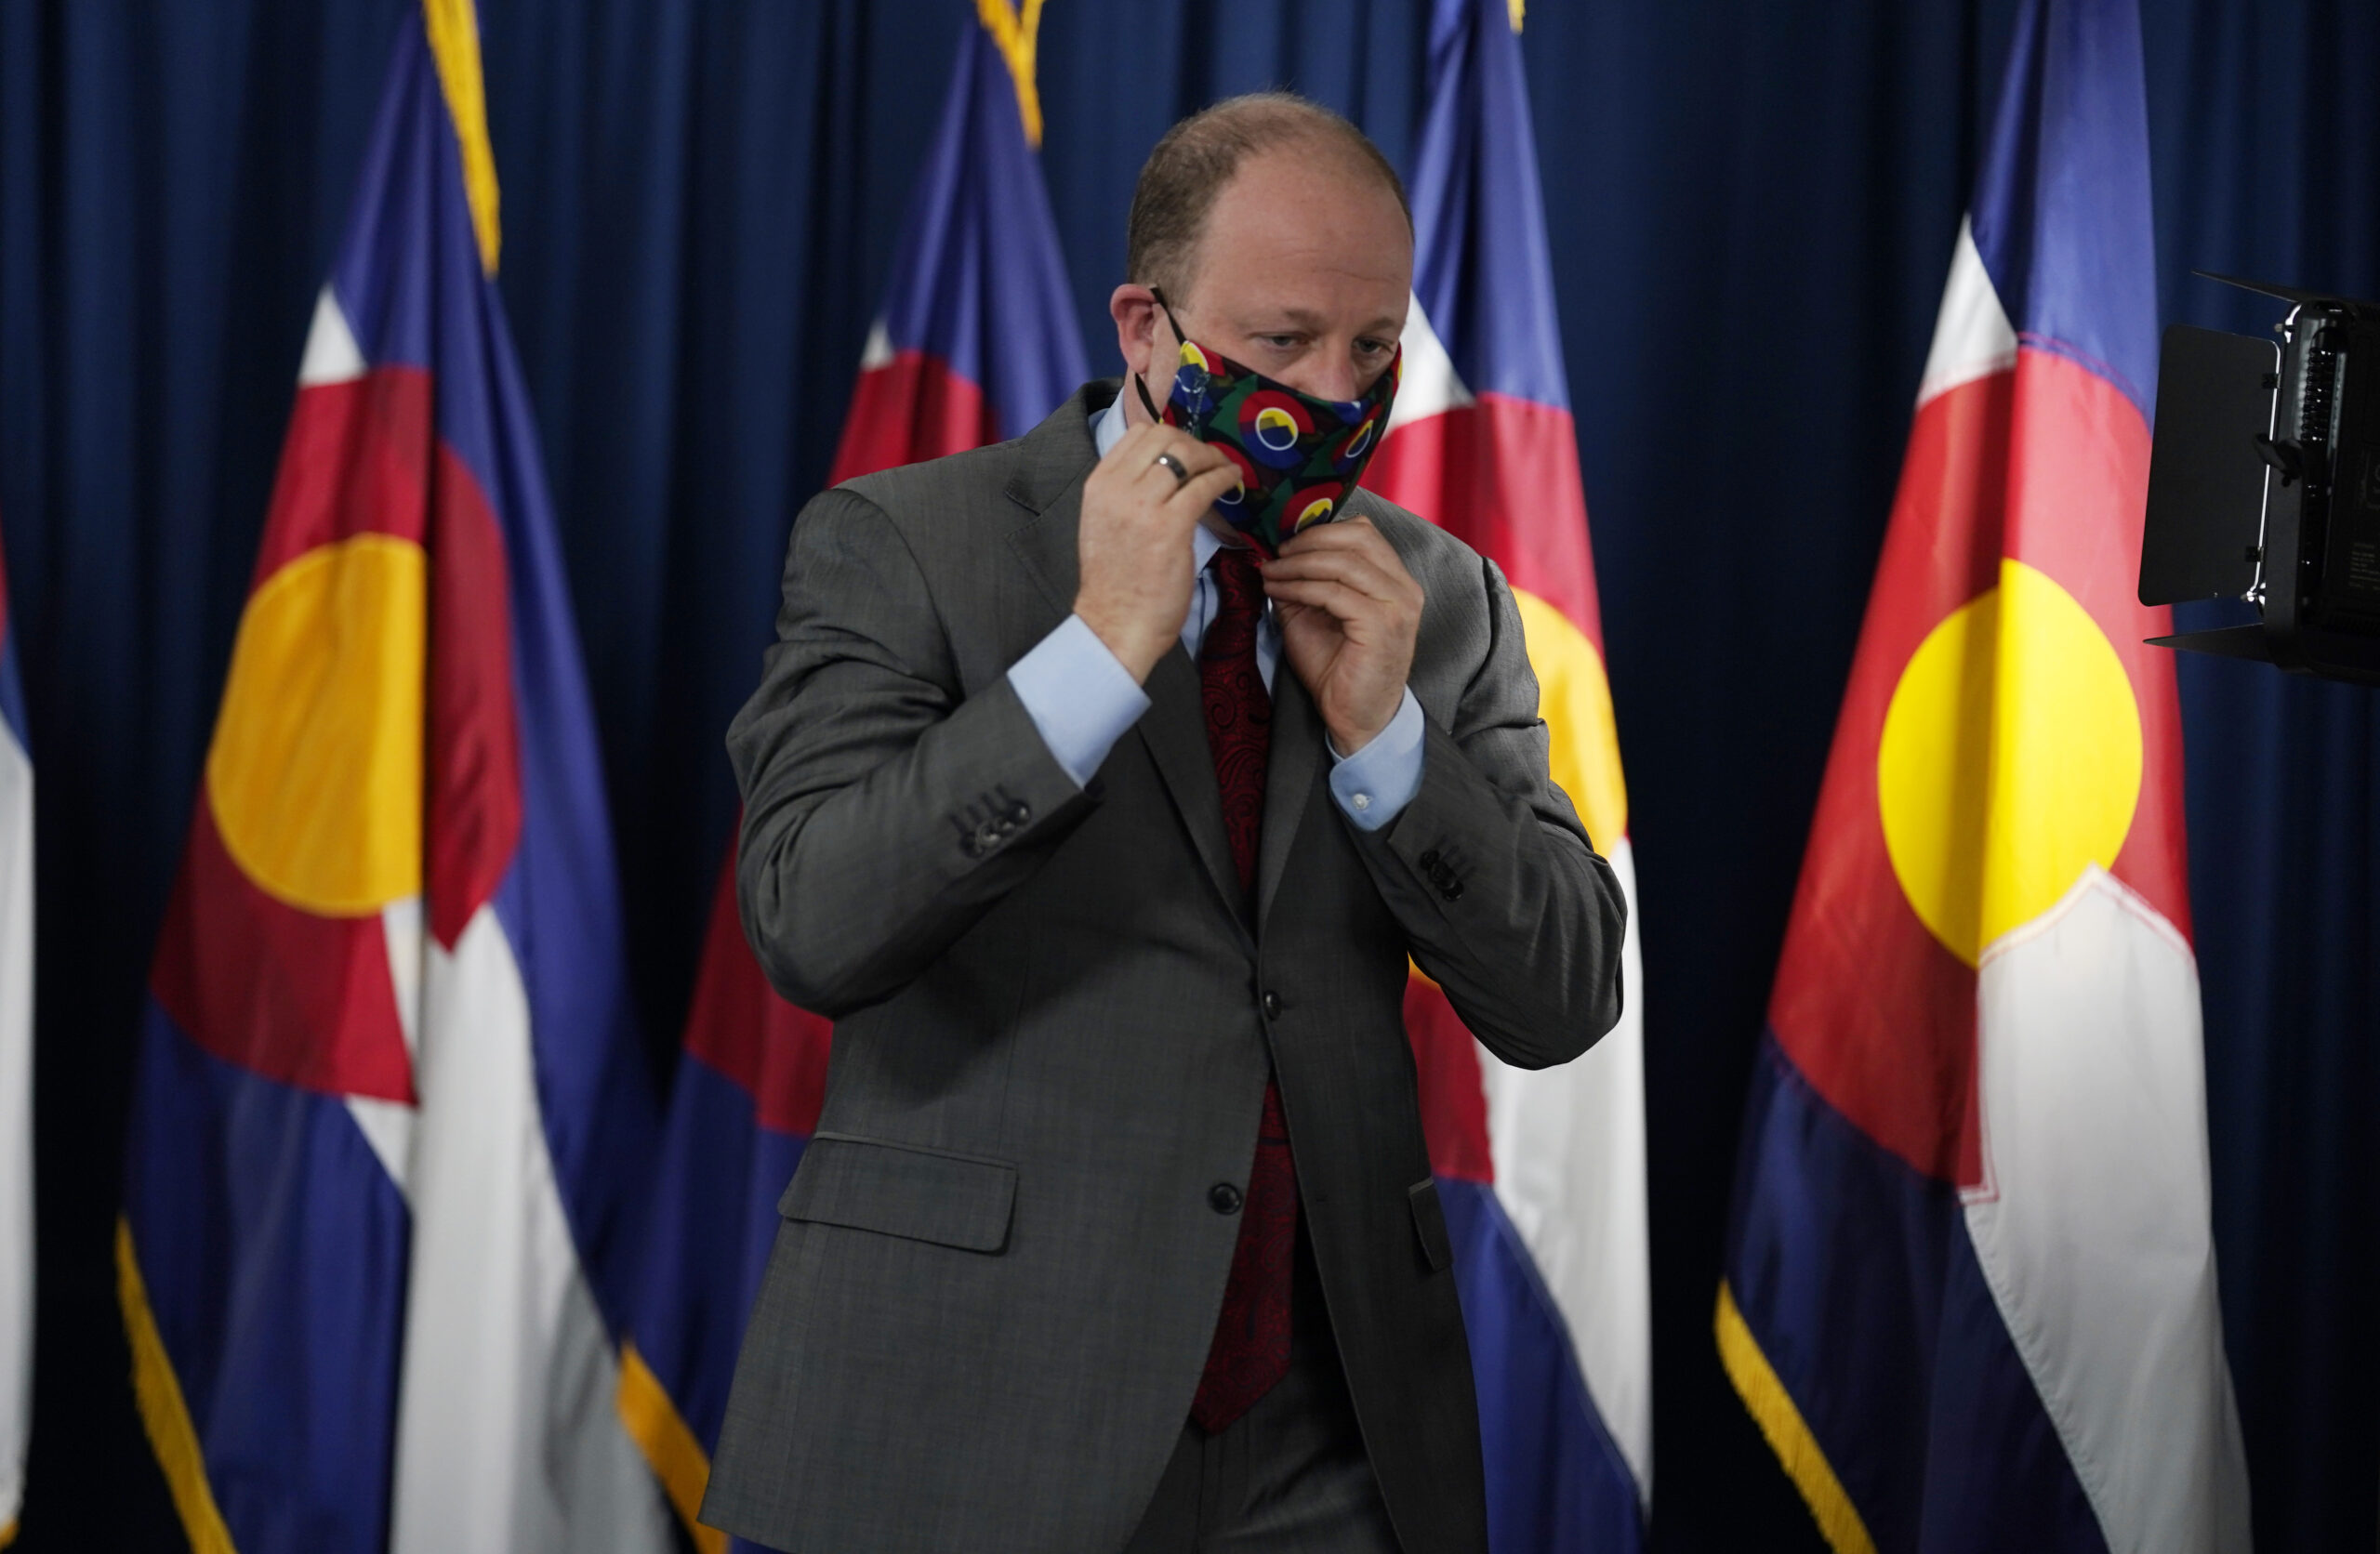 Governor Jared Polis